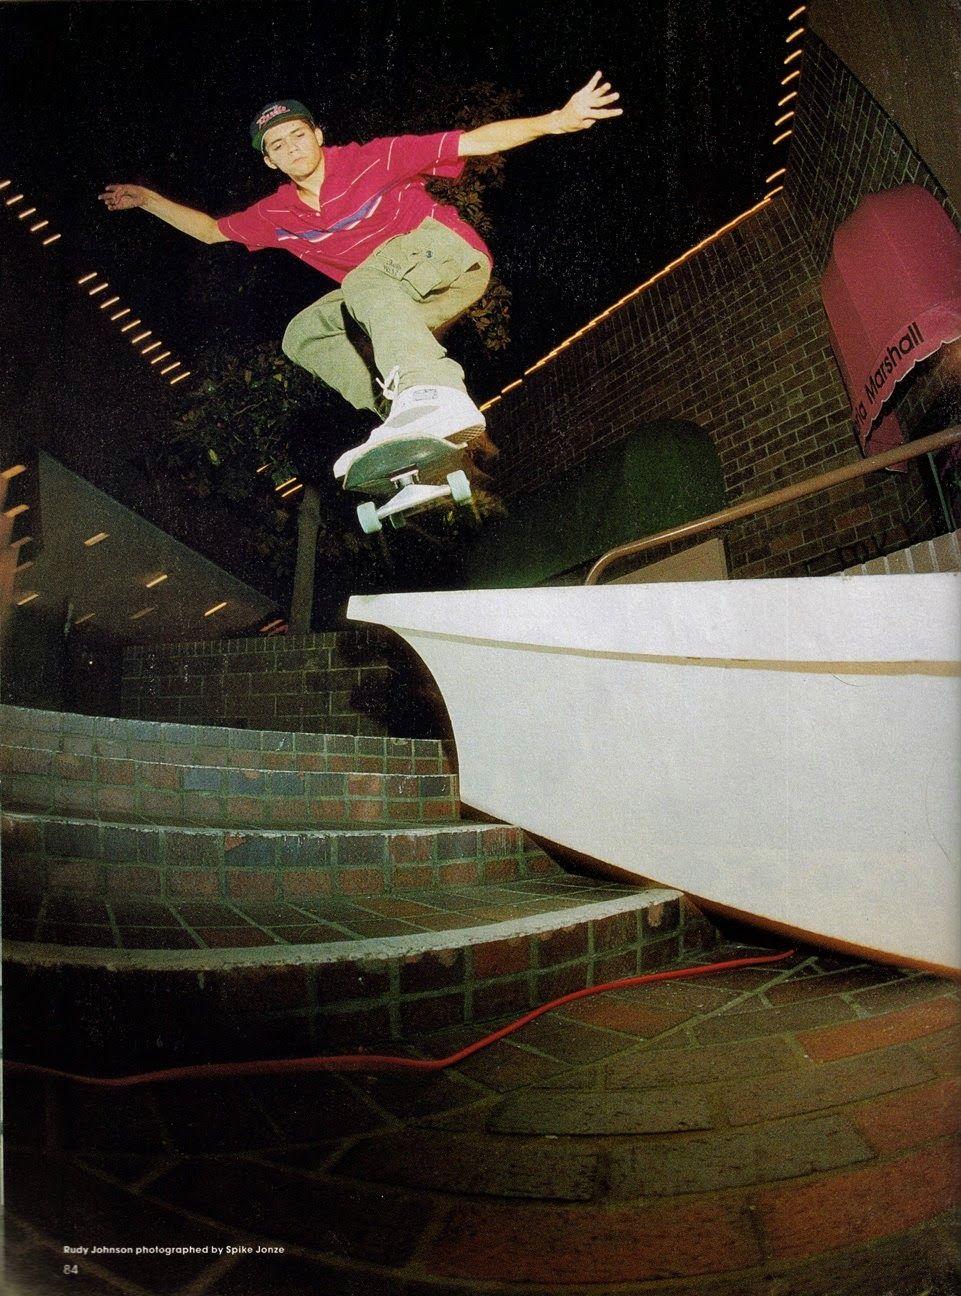 Rudy Johnson Skate, Street culture, Chrome ball